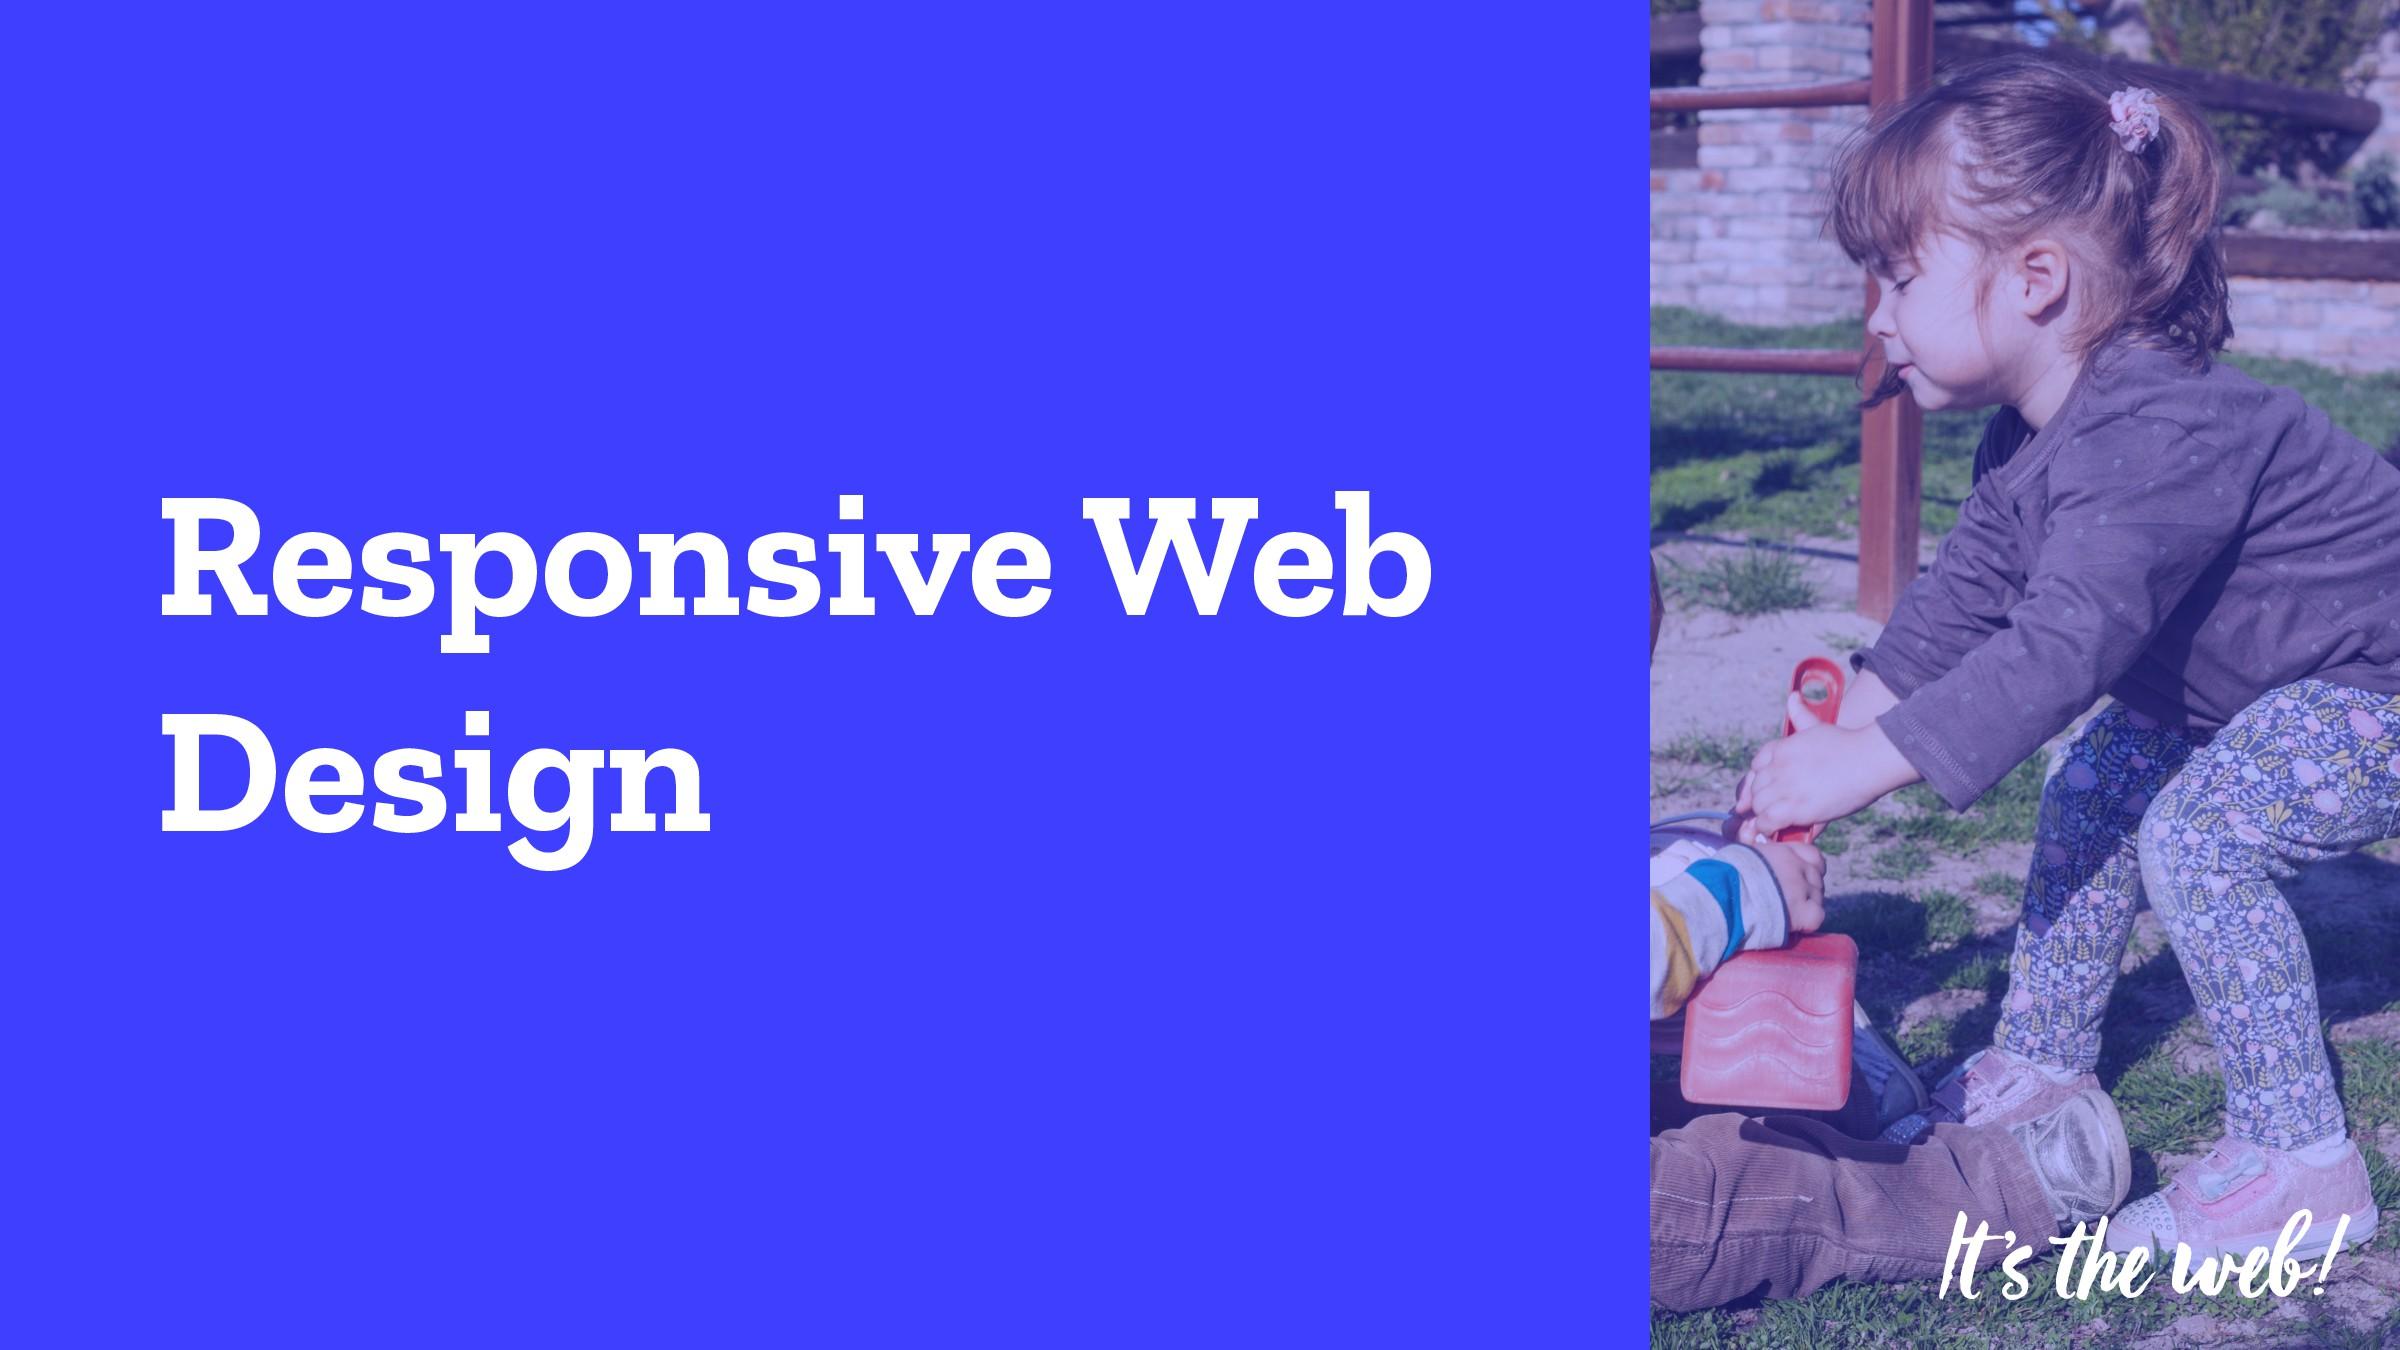 Responsive Web Design It 's !e web!